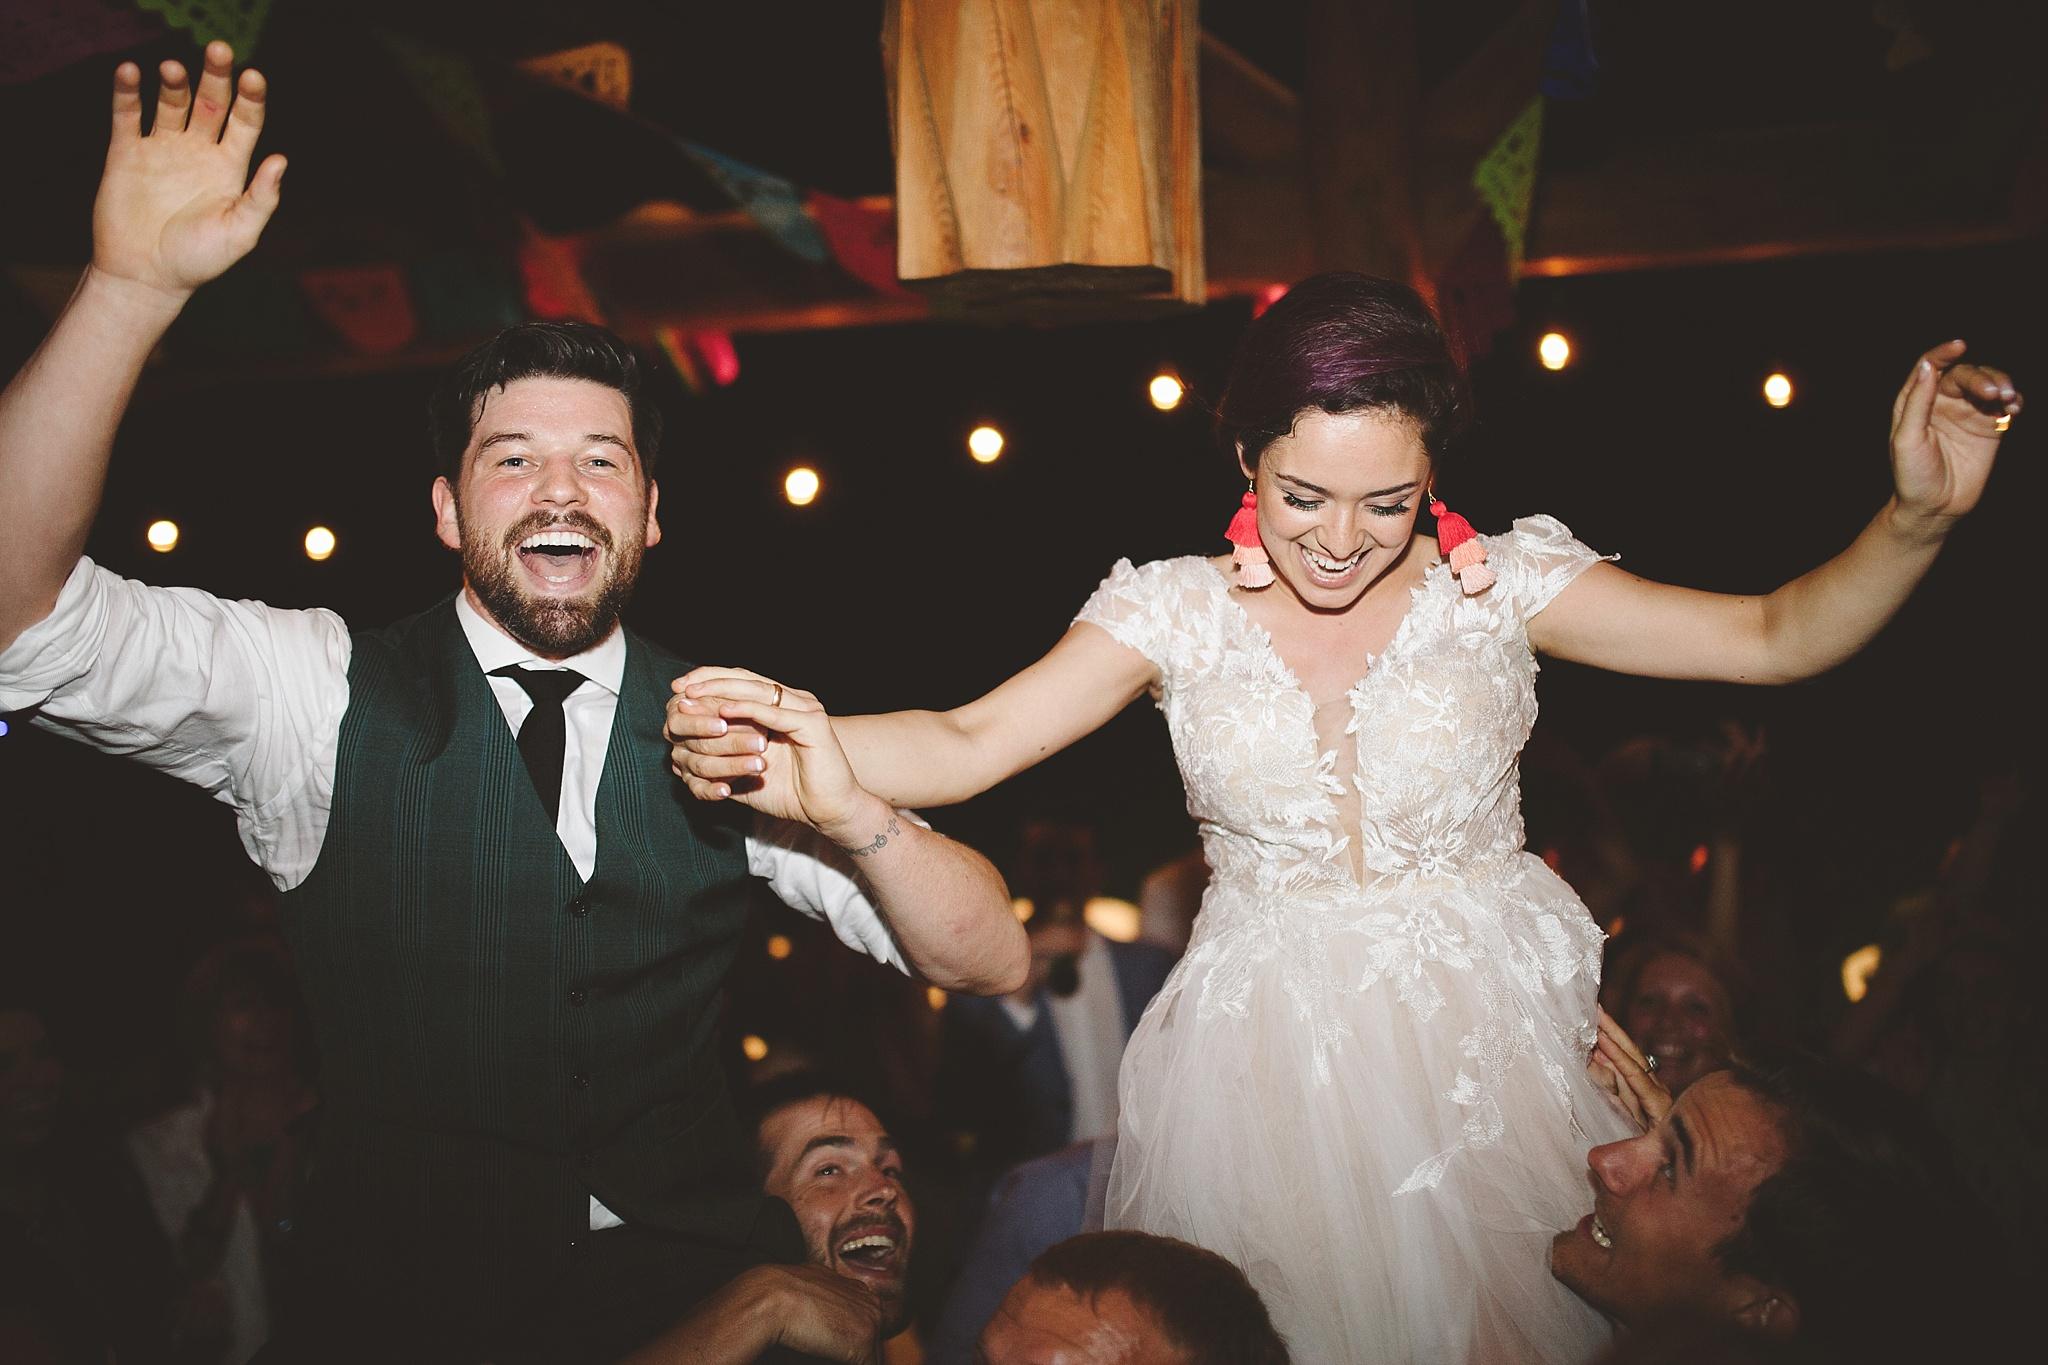 up on shoulders during wedding dance